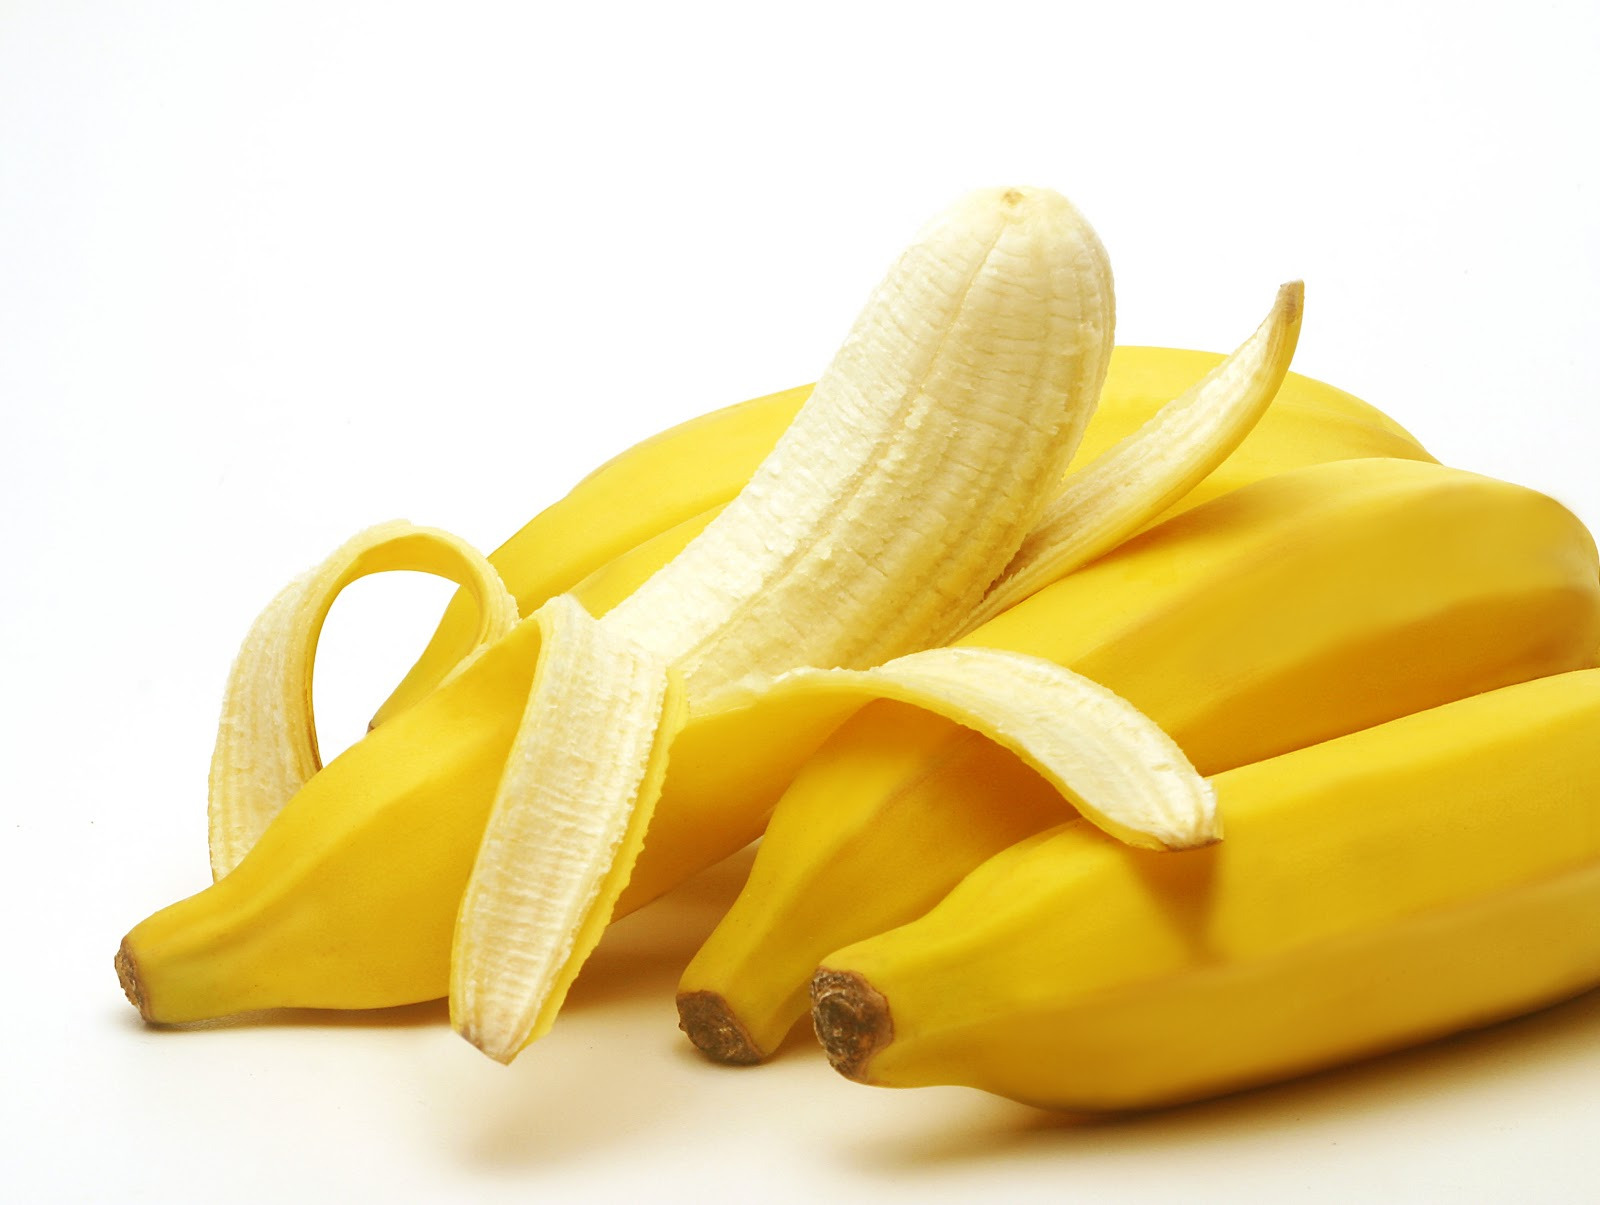 25-razones-poderosas-para-comer-bananos